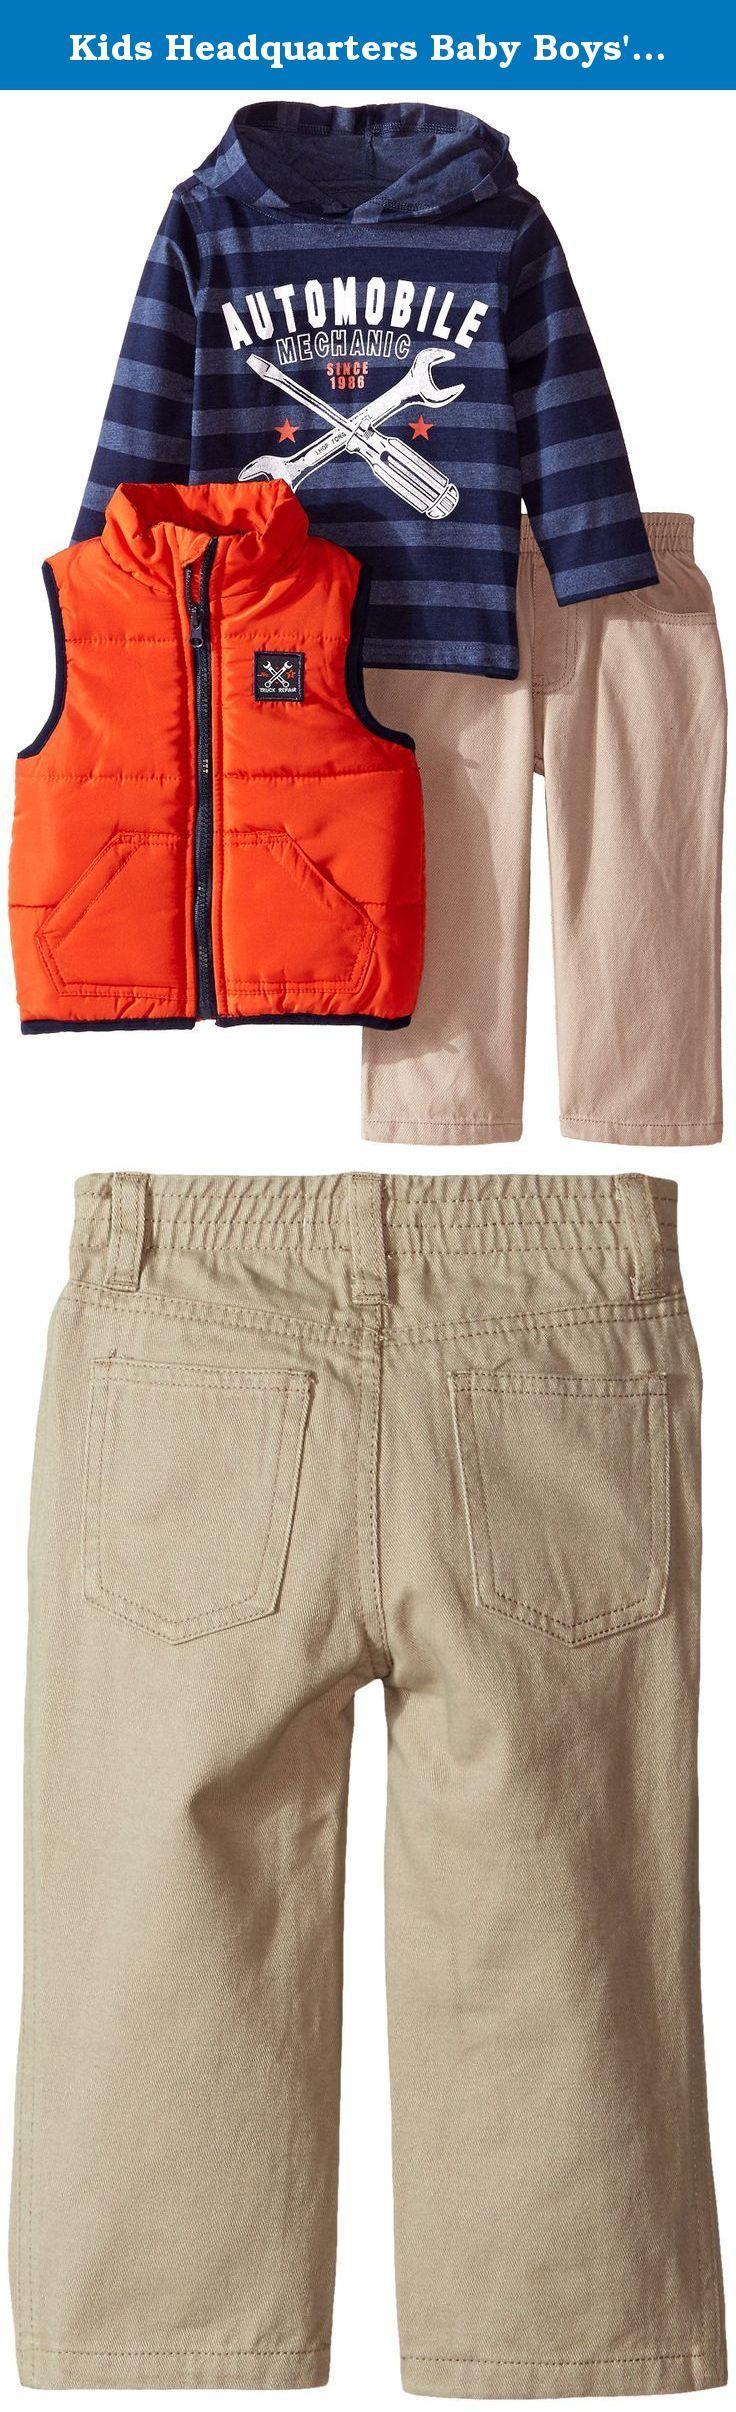 Kids Headquarters Baby Boys' Vest with Stripes Tee and Pants, Orange, 12 Months. Vest pant set.